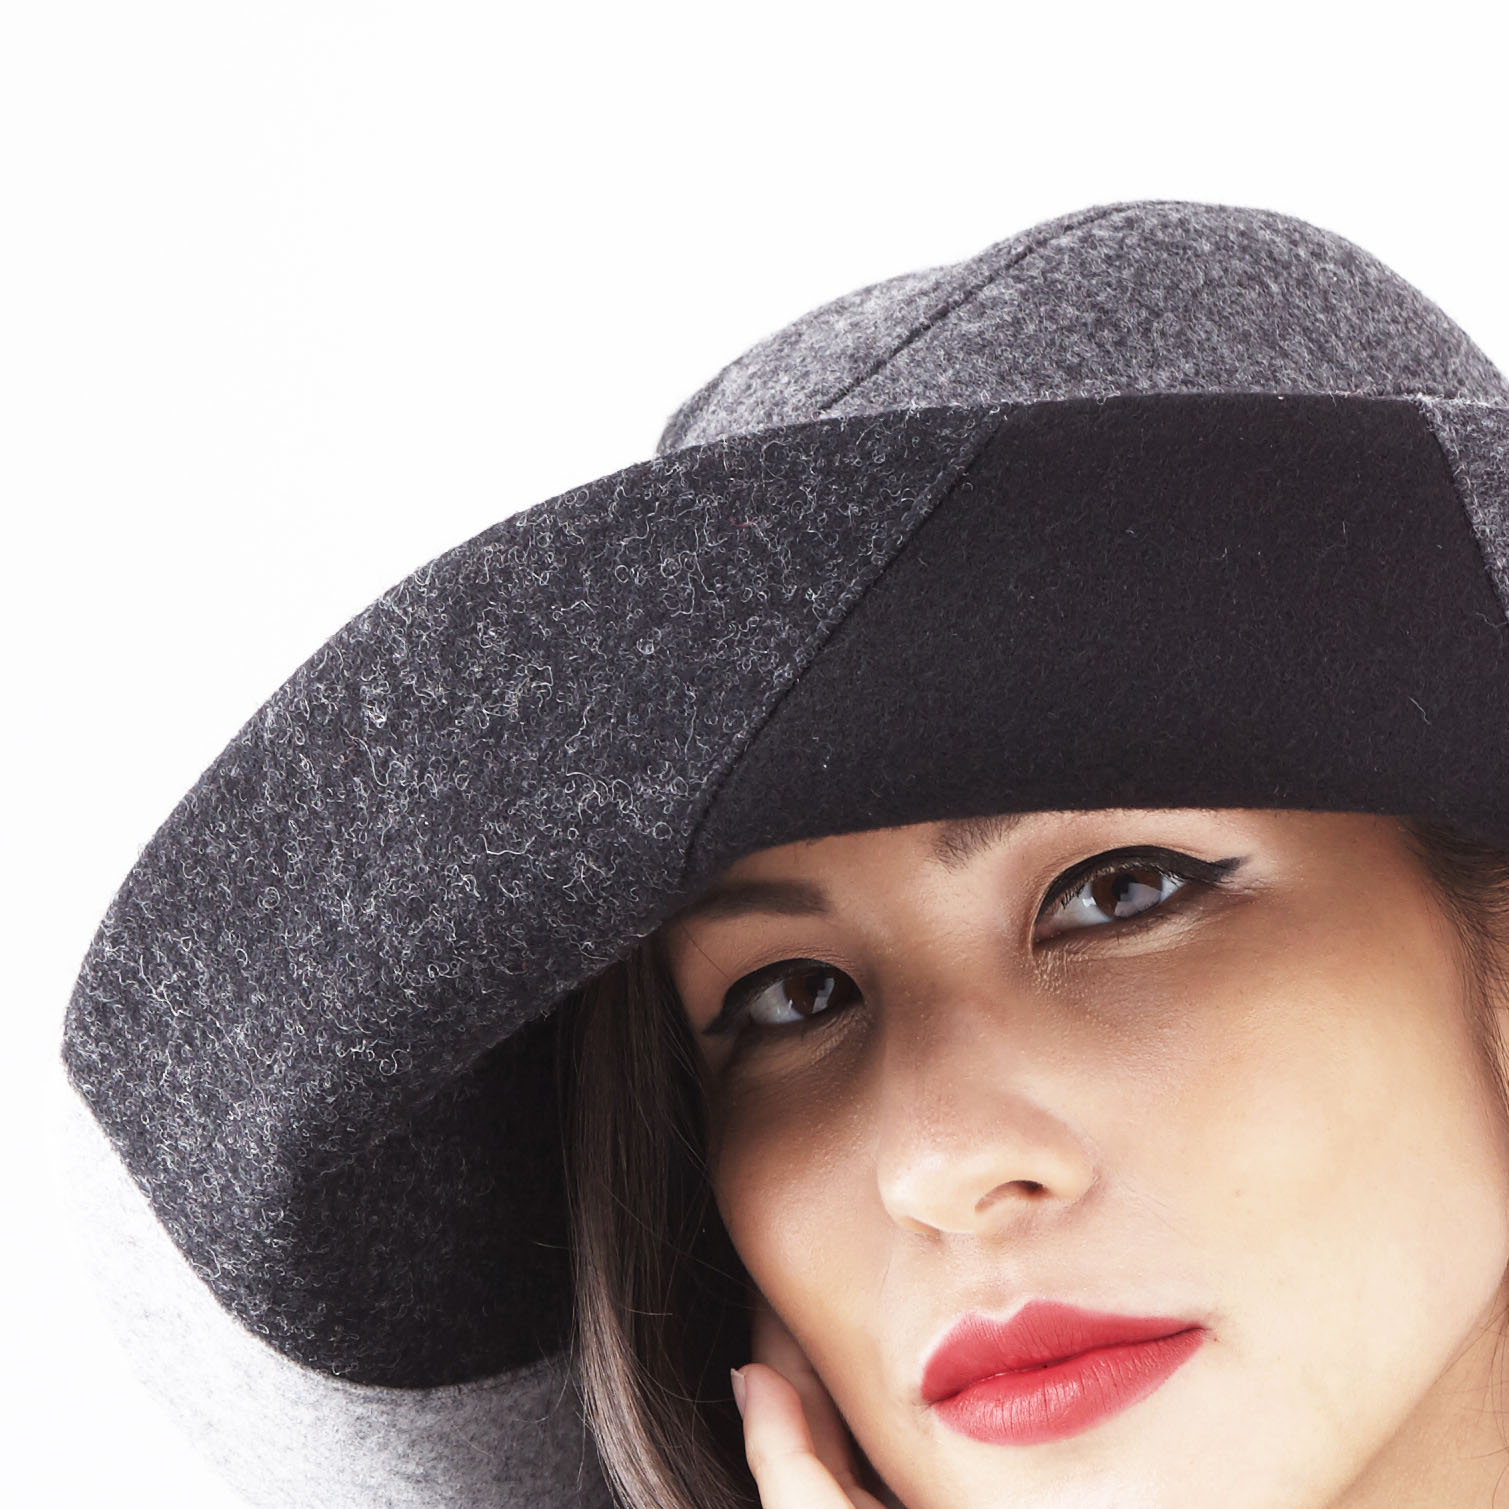 Alexa, women's brimmed hat in grey by Karen Henriksen